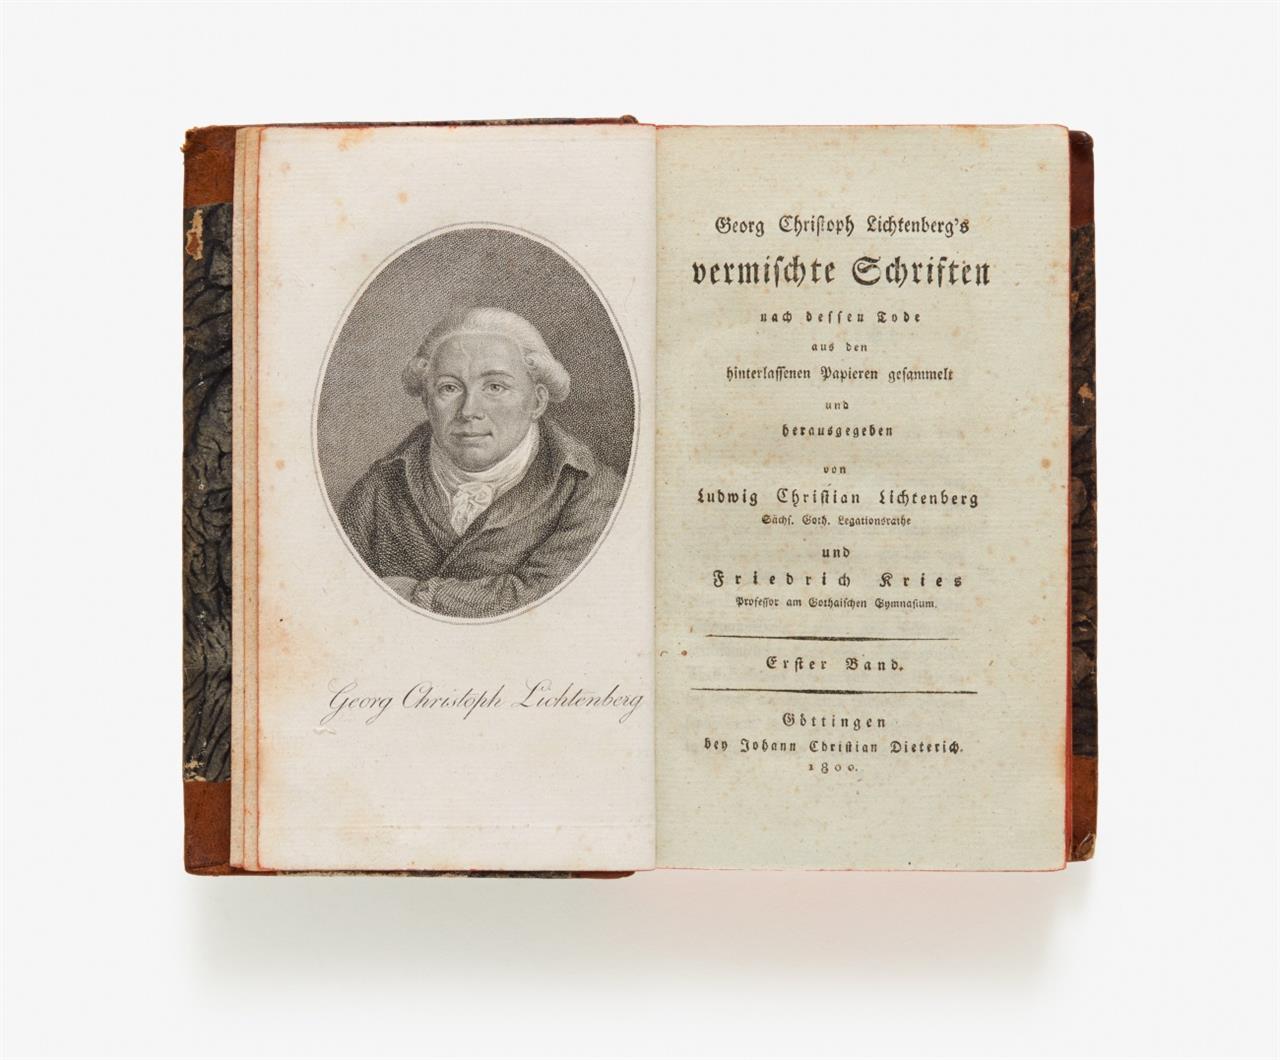 G. C.Lichtenberg, Vermischte Schriften. 9 Bde. Göttingen 1800-1806. - EGesA.